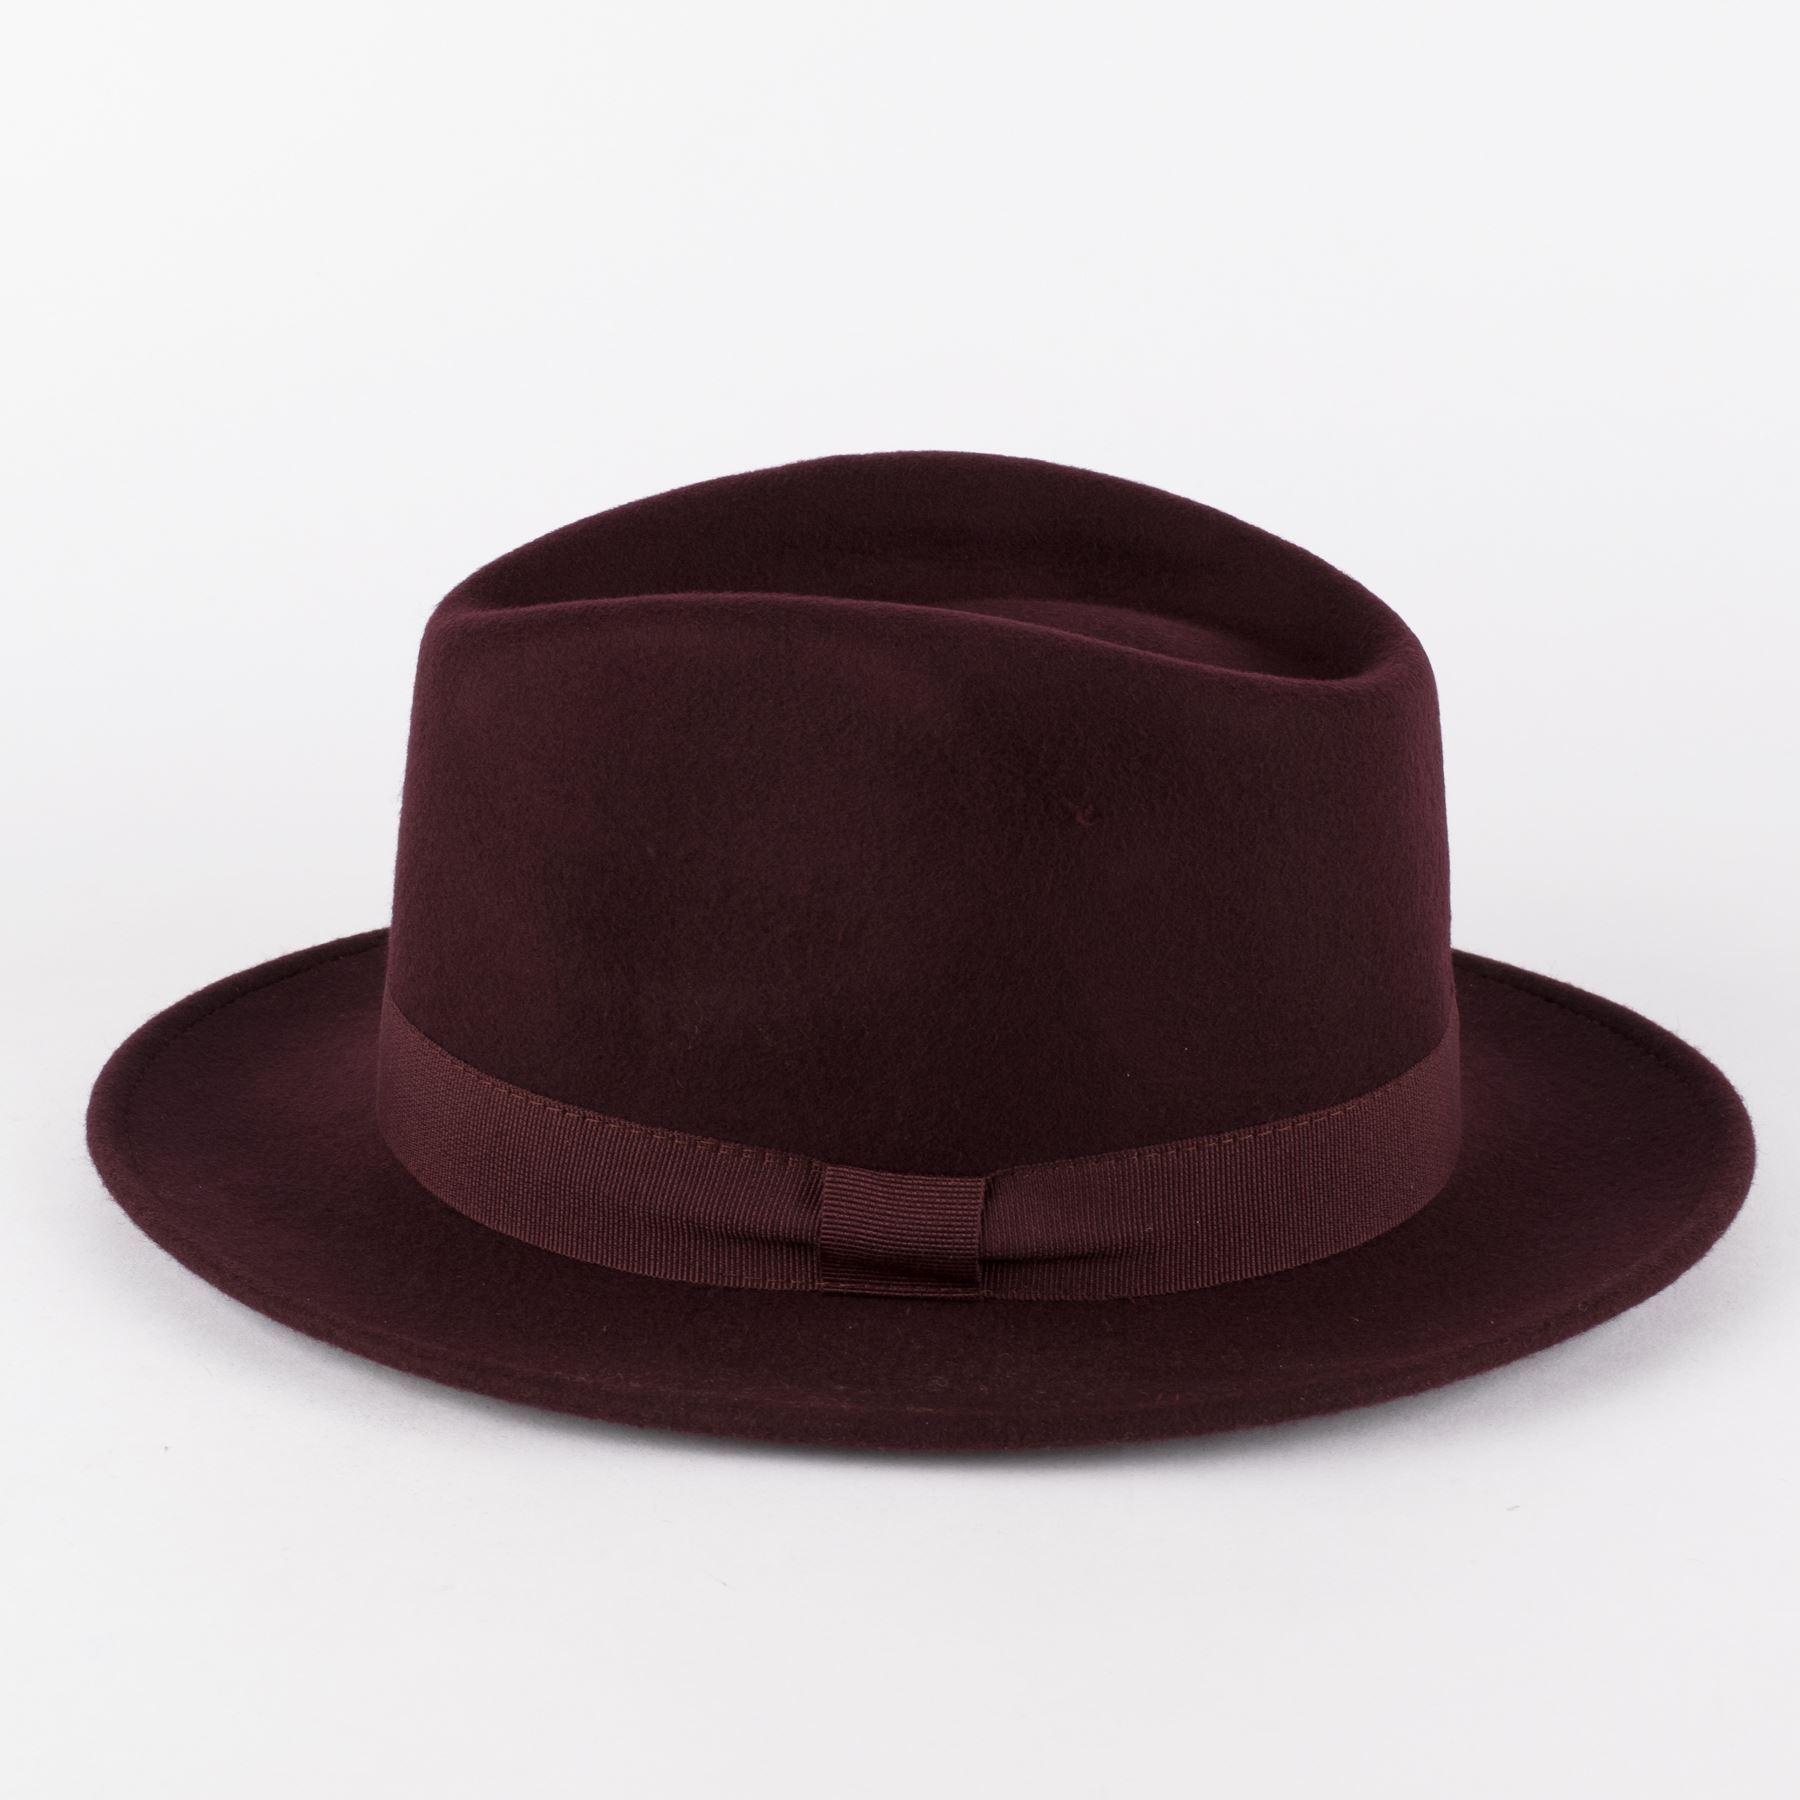 100/% Wool Felt Fedora Hat with Grosgrain Band Handmade in Italy